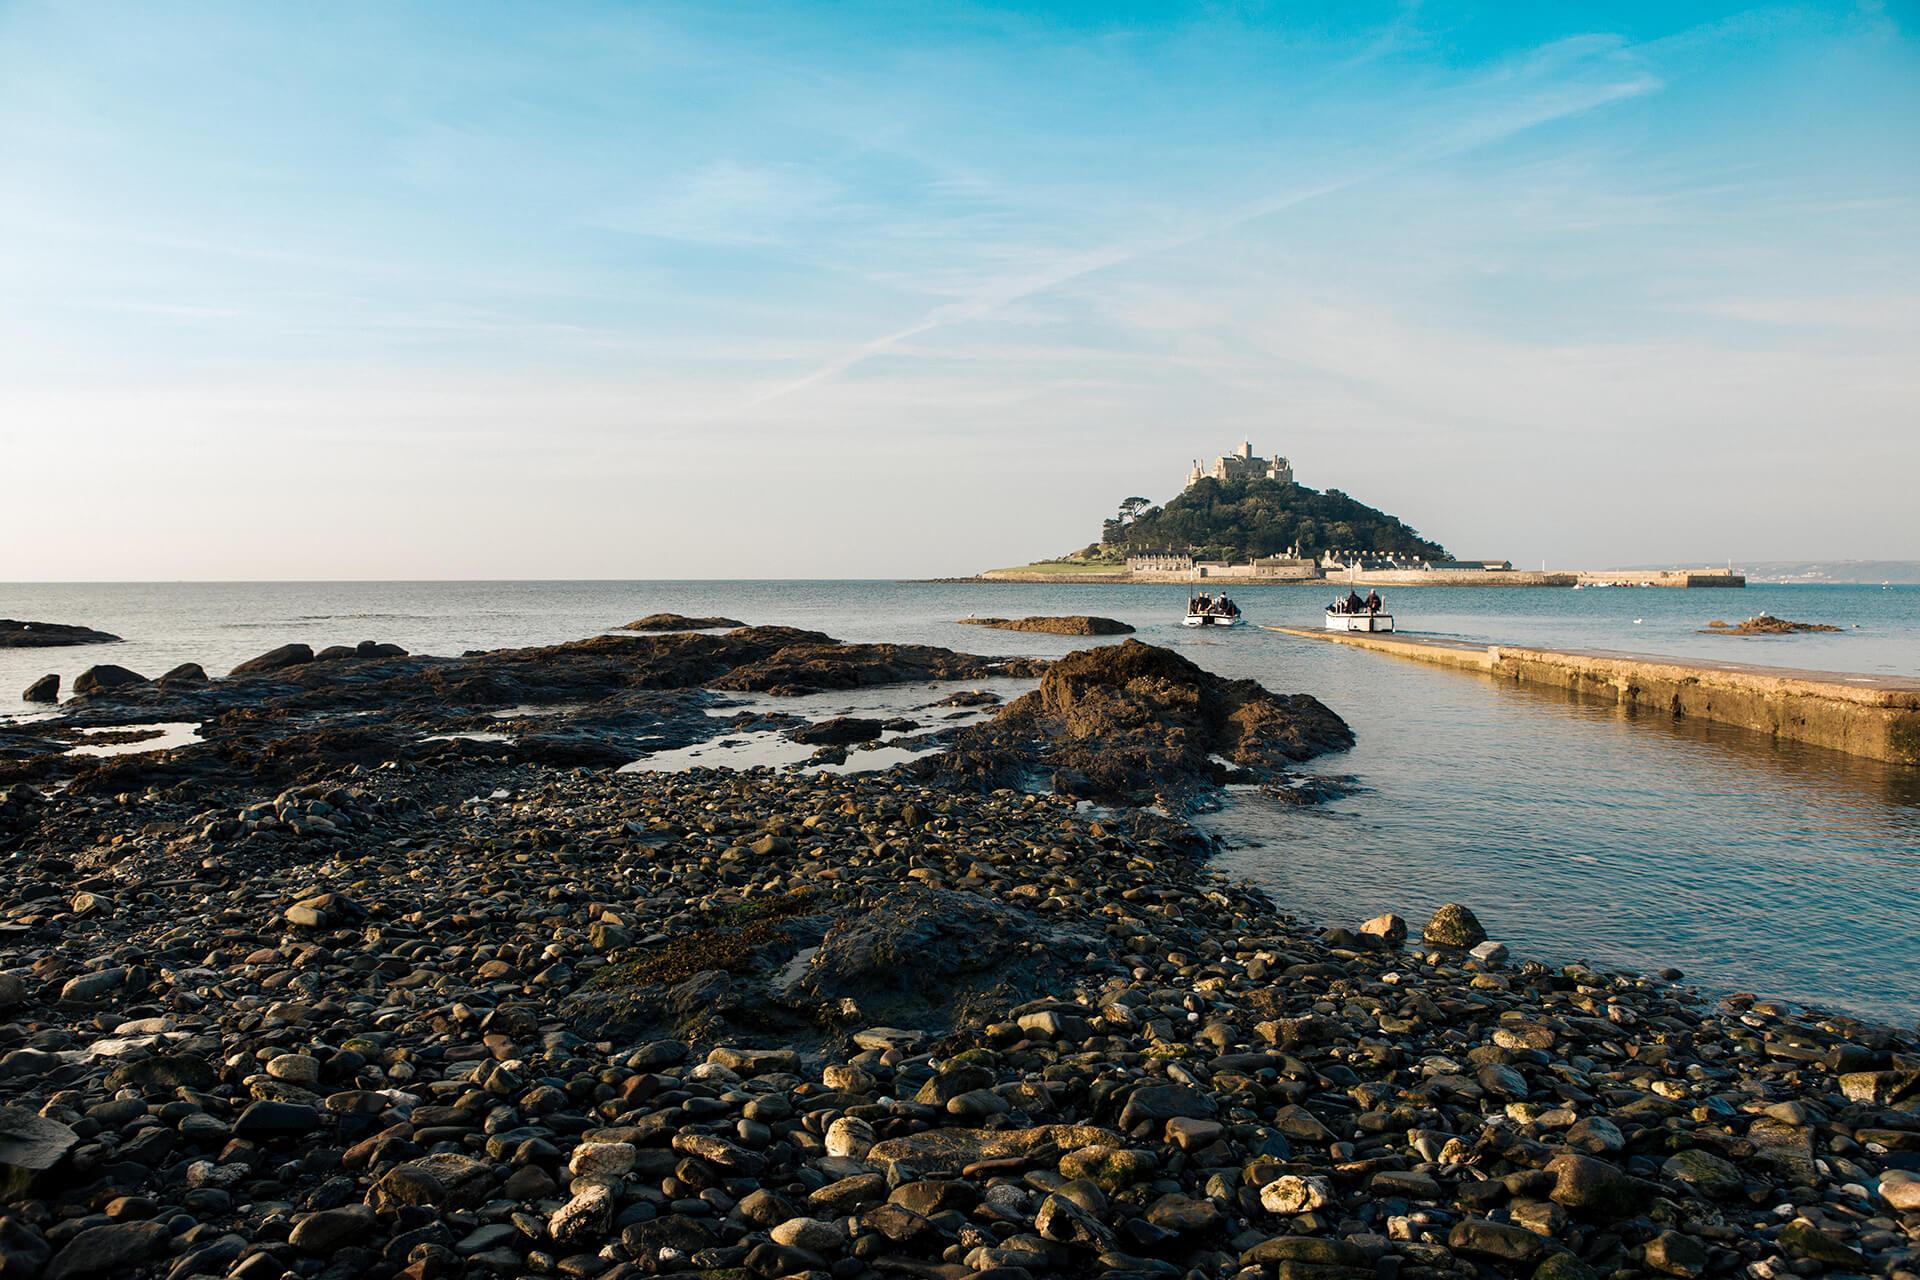 Wild Britain, Barbour, Lake, England, Trees, Rocks, Agency, WeAreShuffle, Sea, Stones